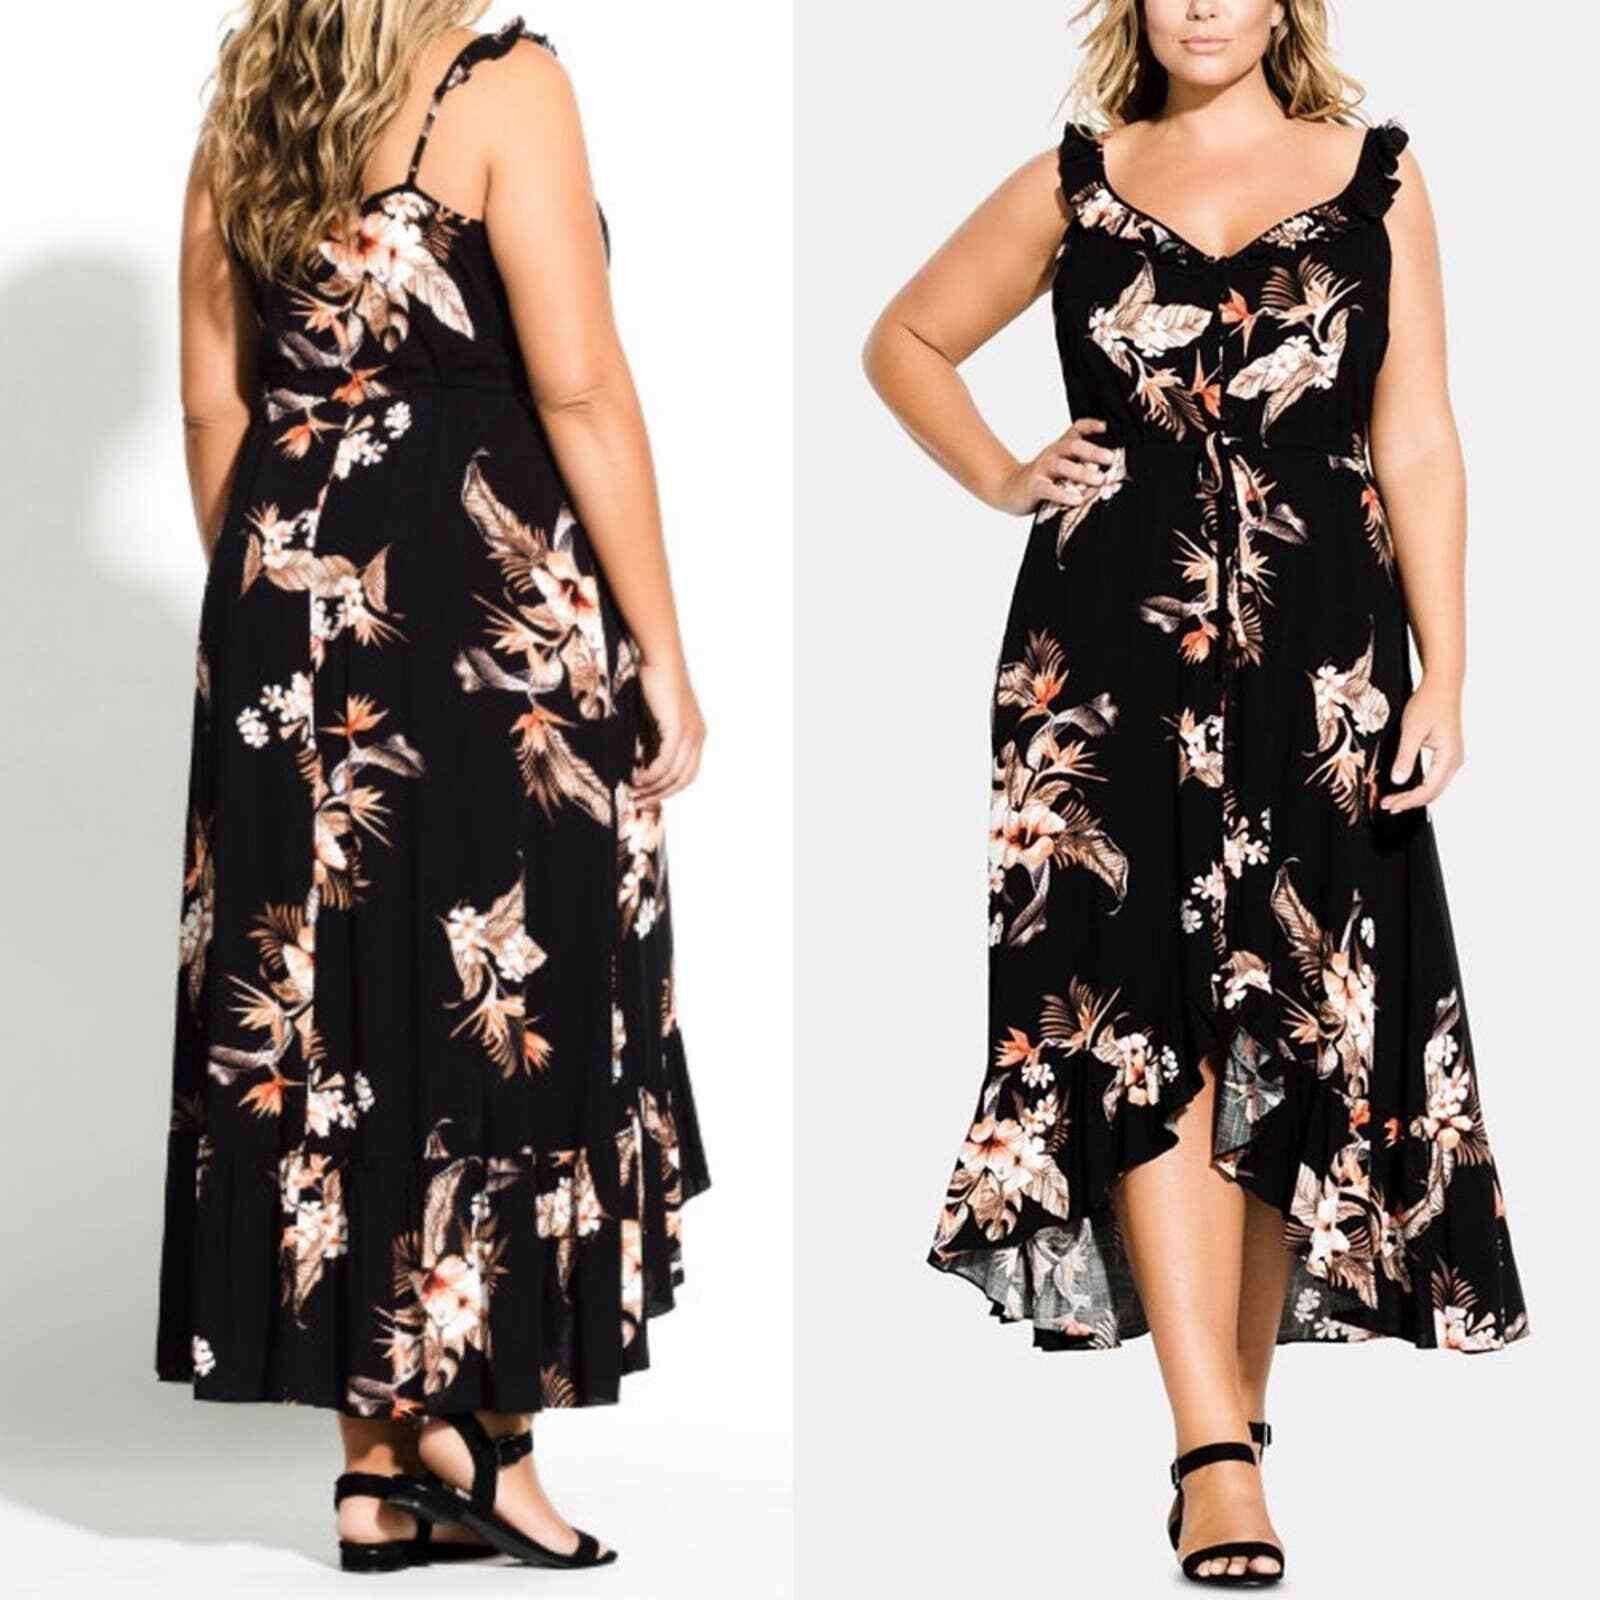 City Chic Seville Black Floral Swing Midi Dress - image 9